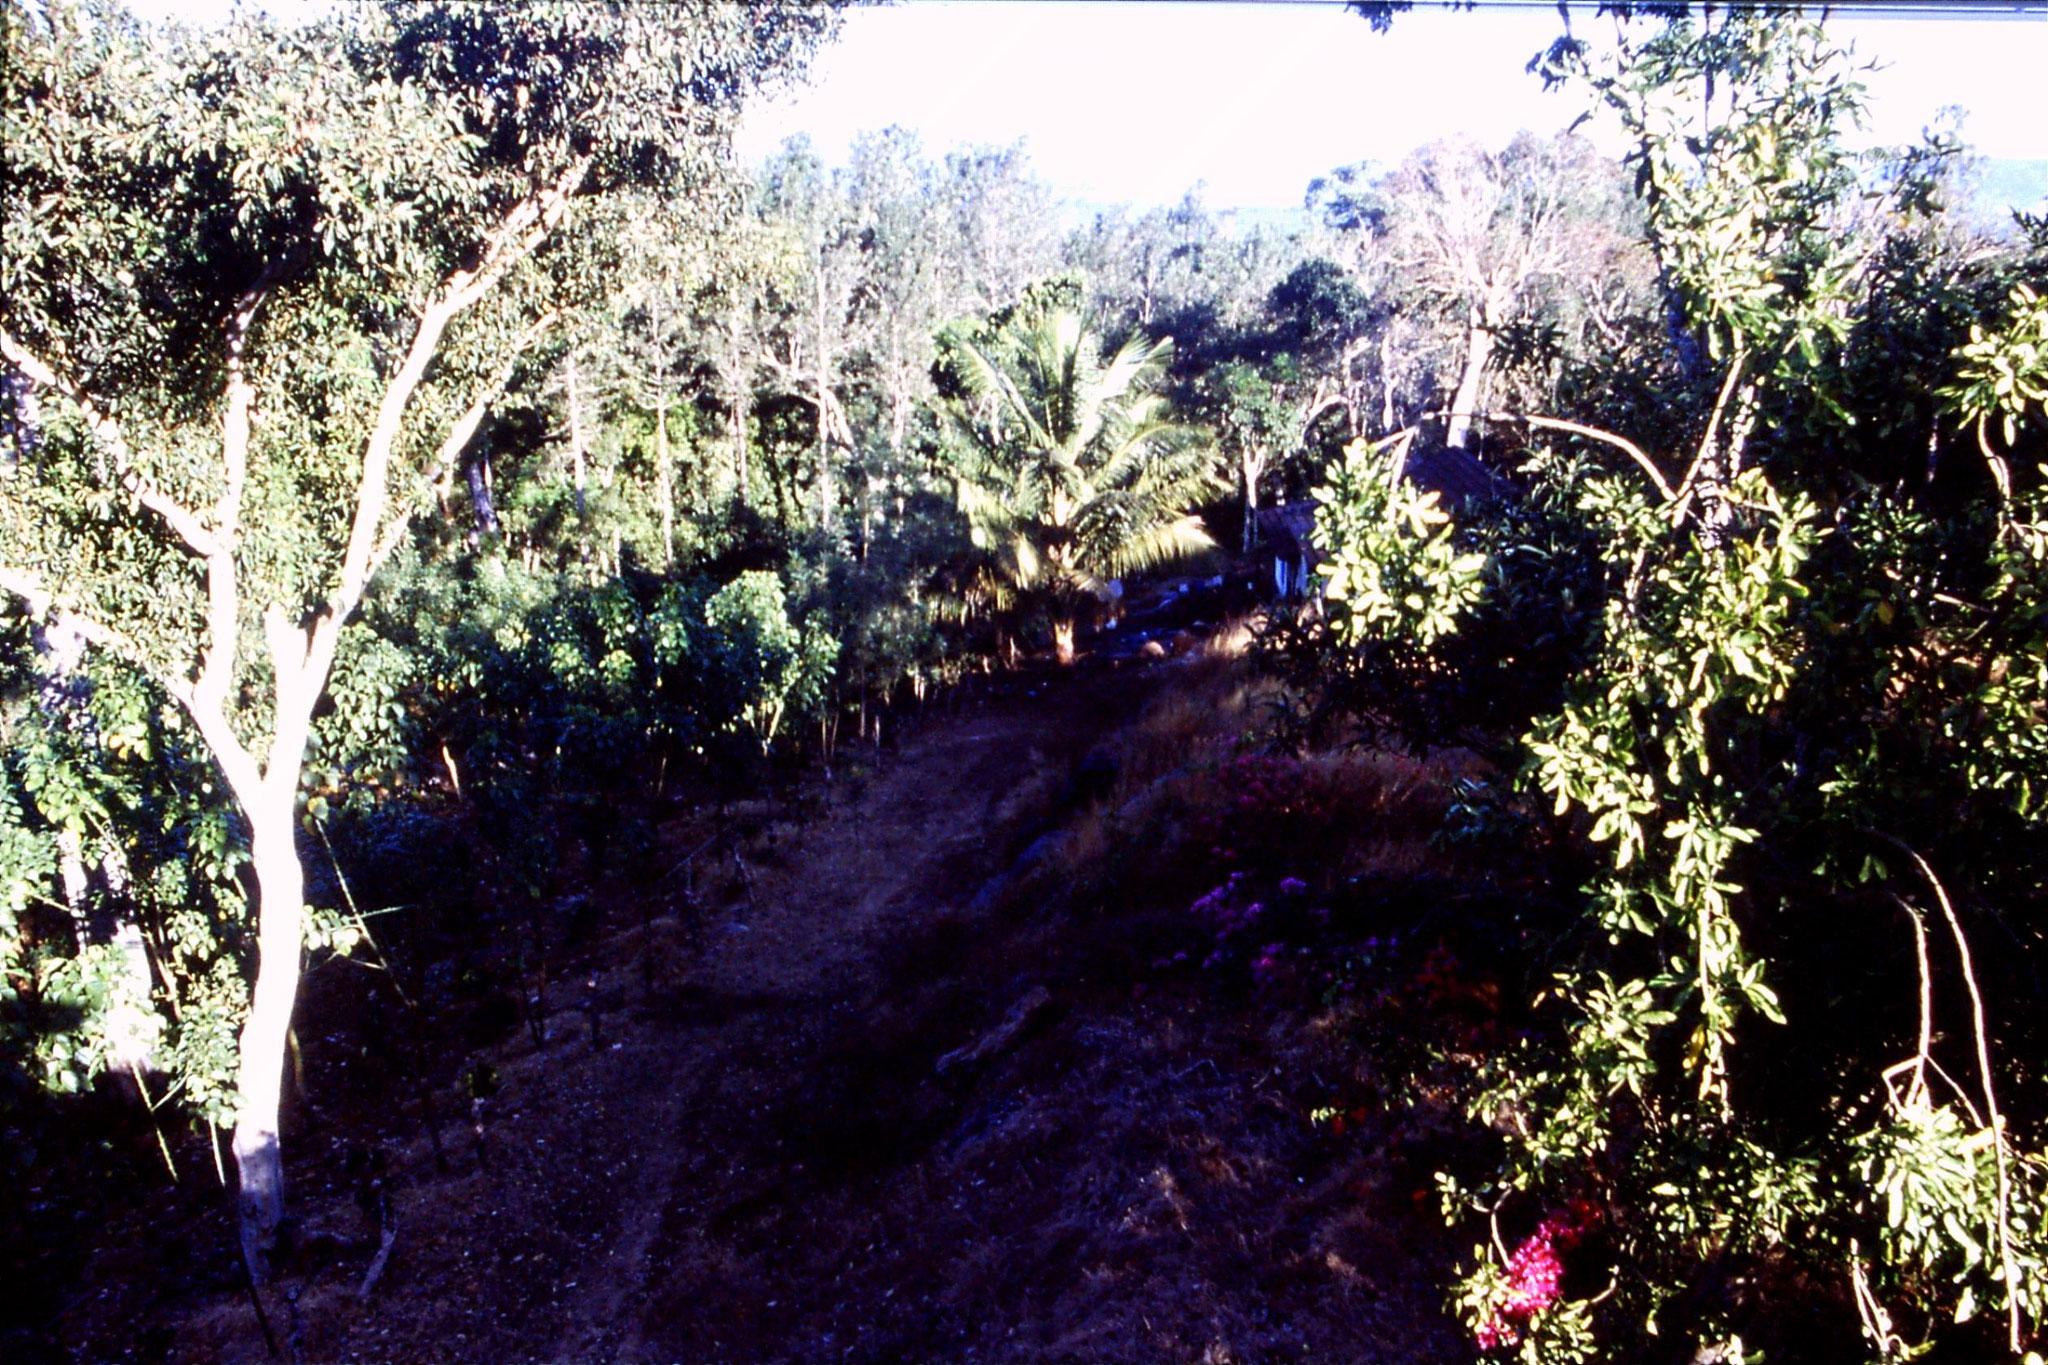 108/2: 9/3/1990 Suntikoppa - garden with coffee bushes